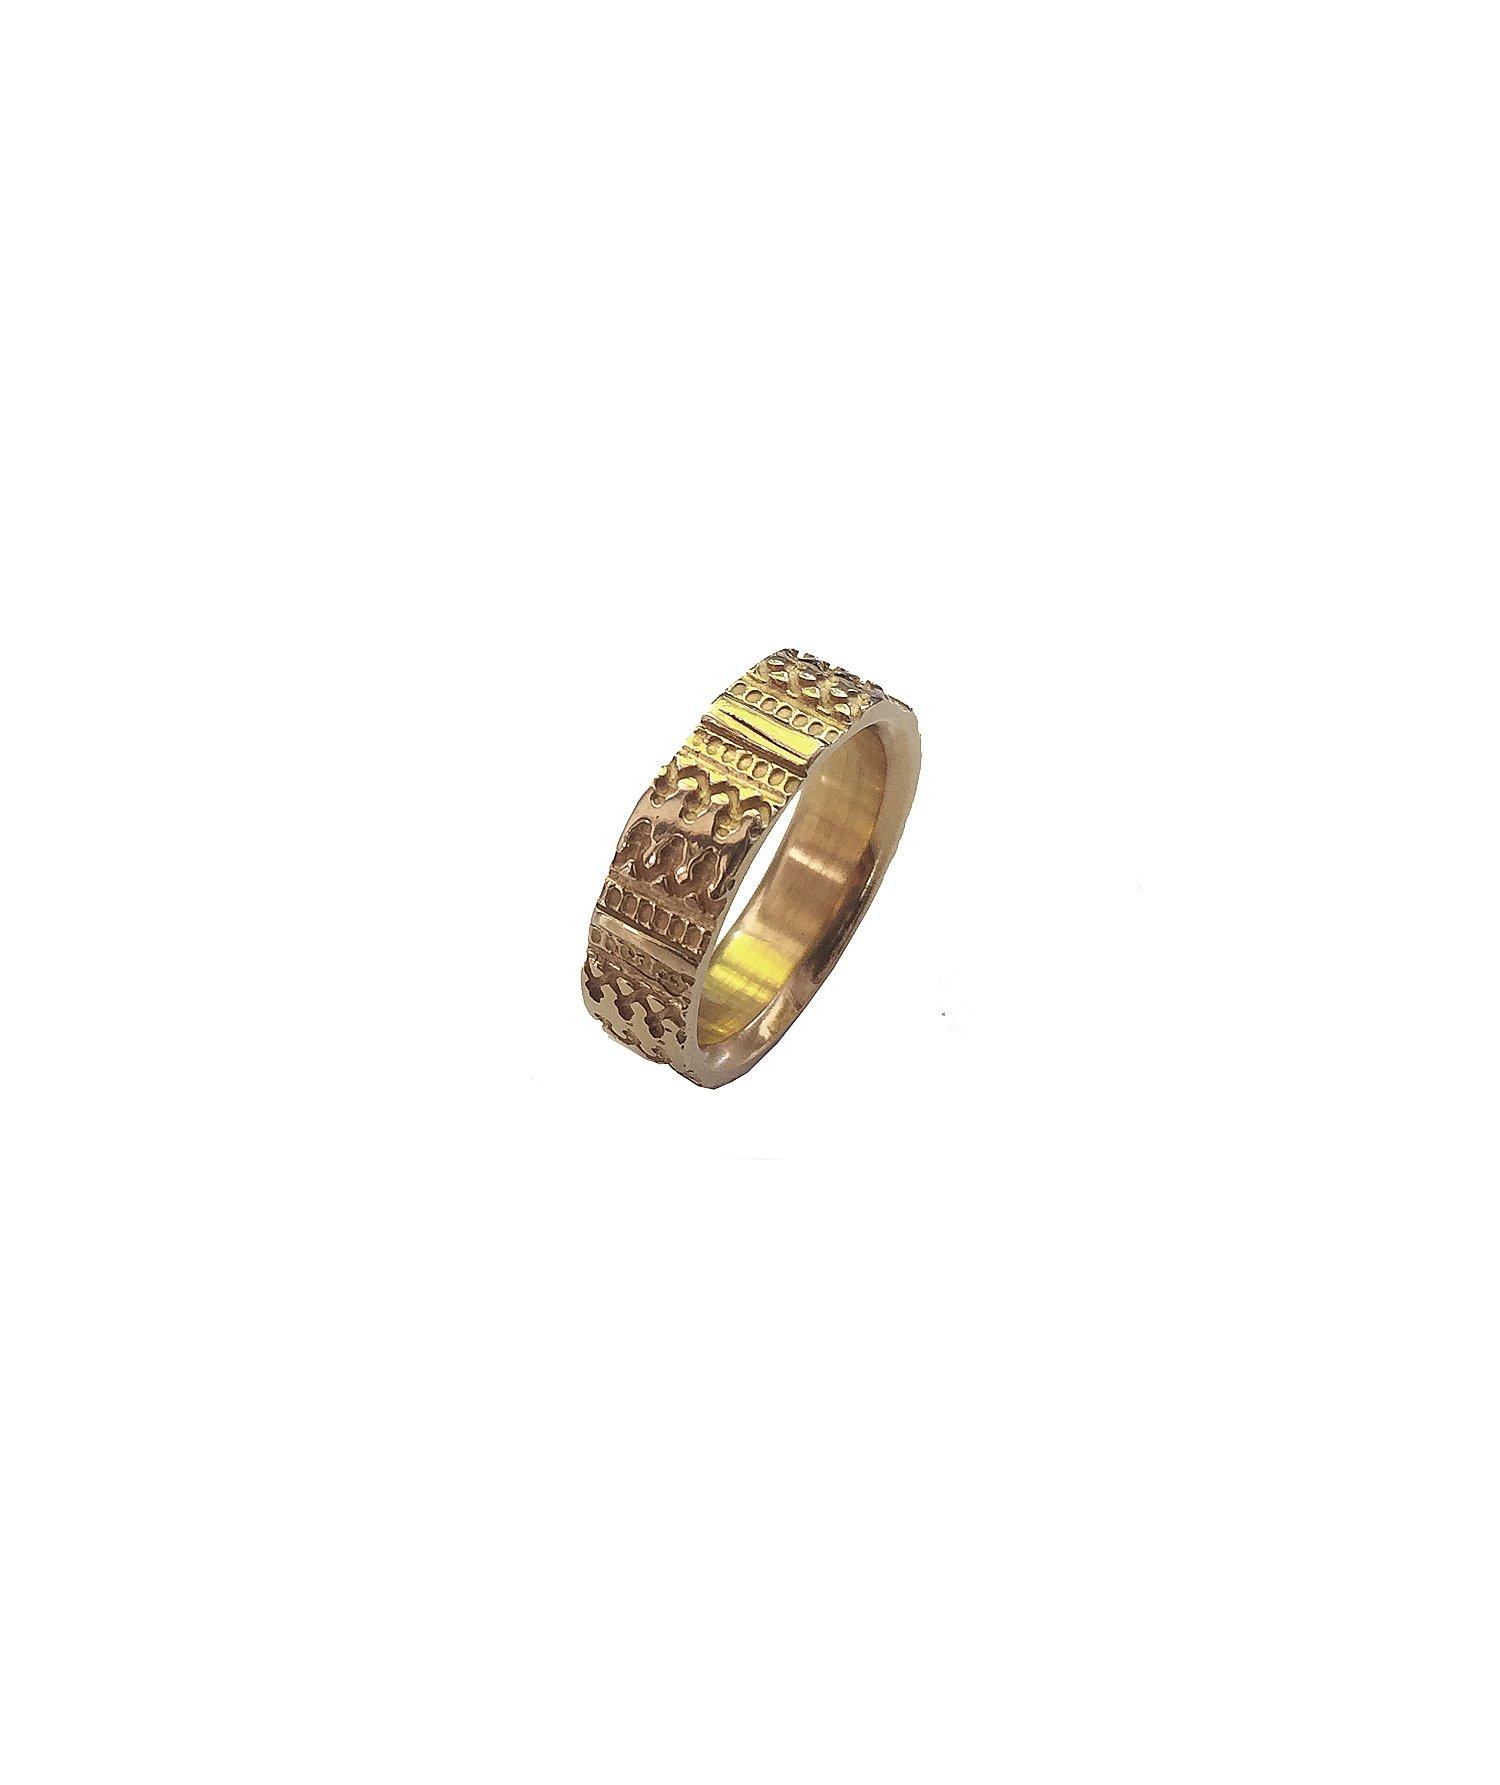 Image of Gandharva Imprint, SLIM-yellow gold